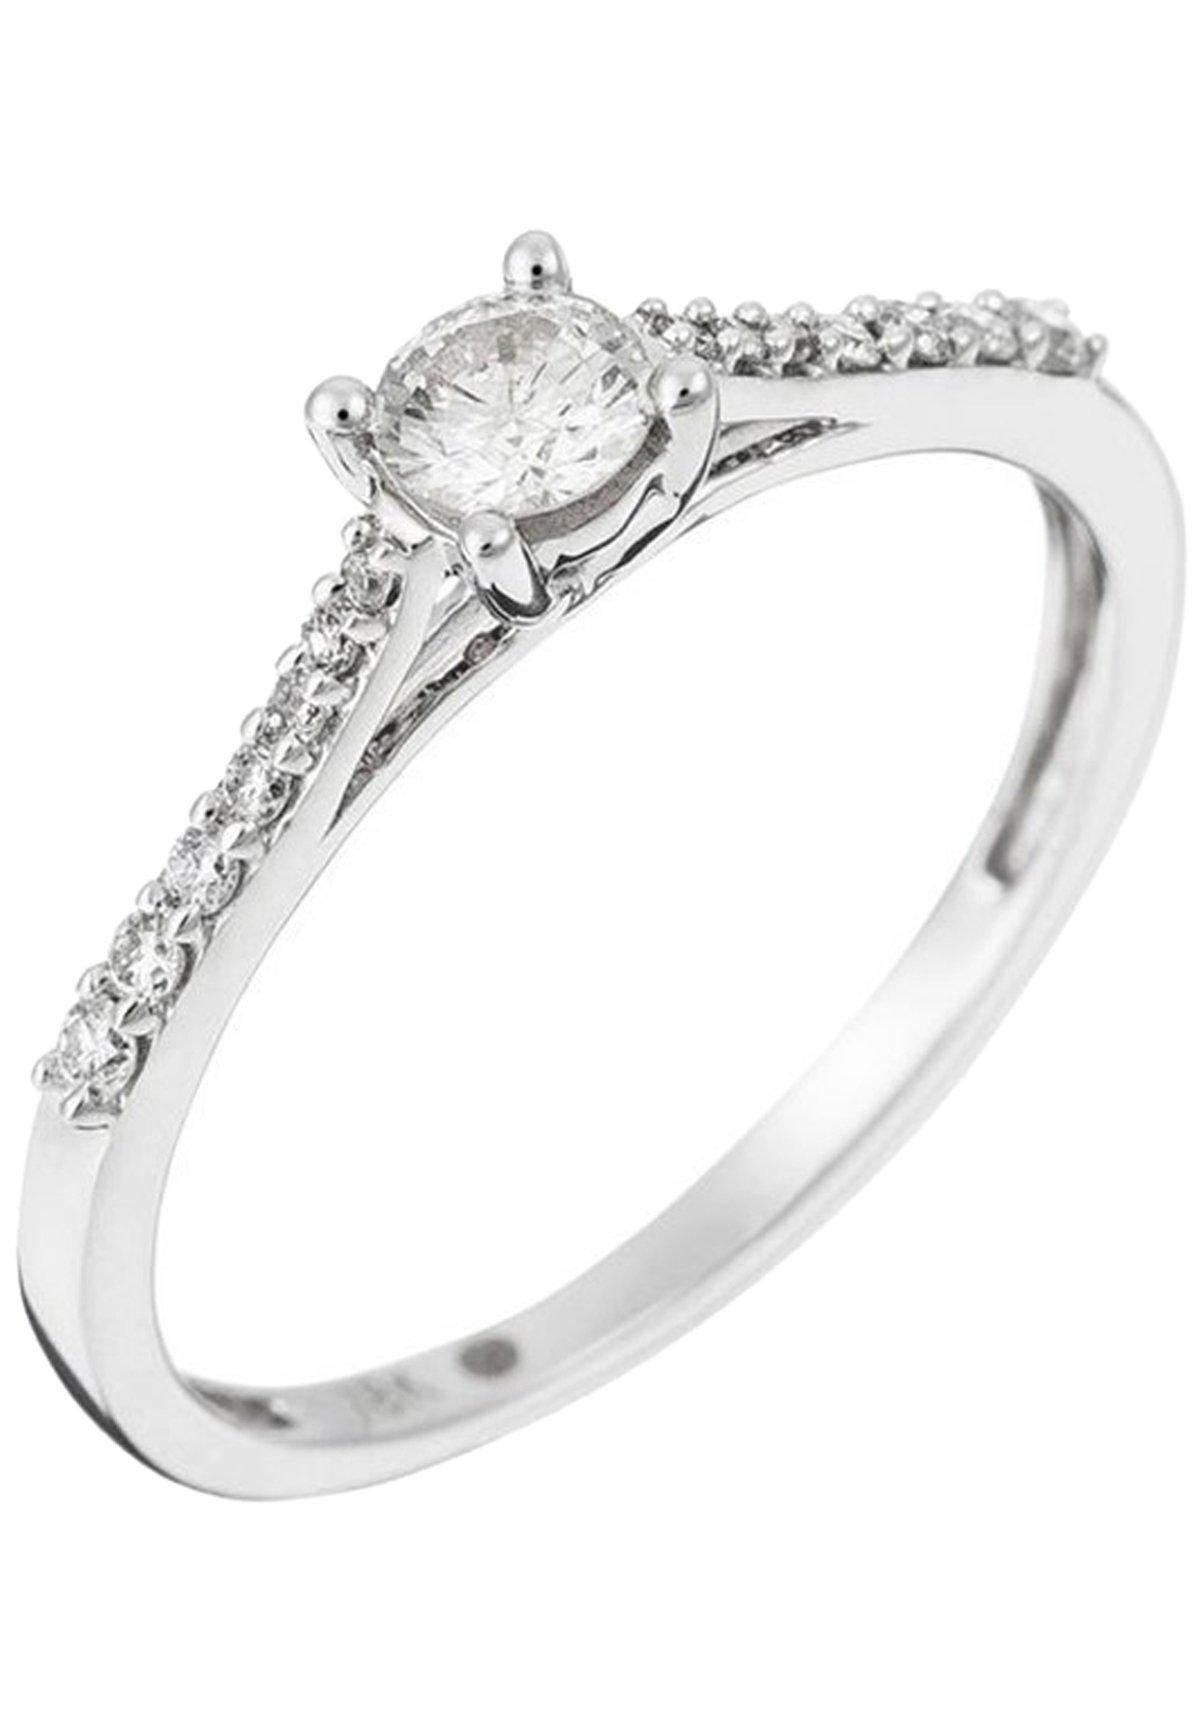 Damen WHITE GOLD RING 18K CERTIFIED 15 DIAMONDS HSI AND 14 DIAMONDS 0.10 CT - Ring